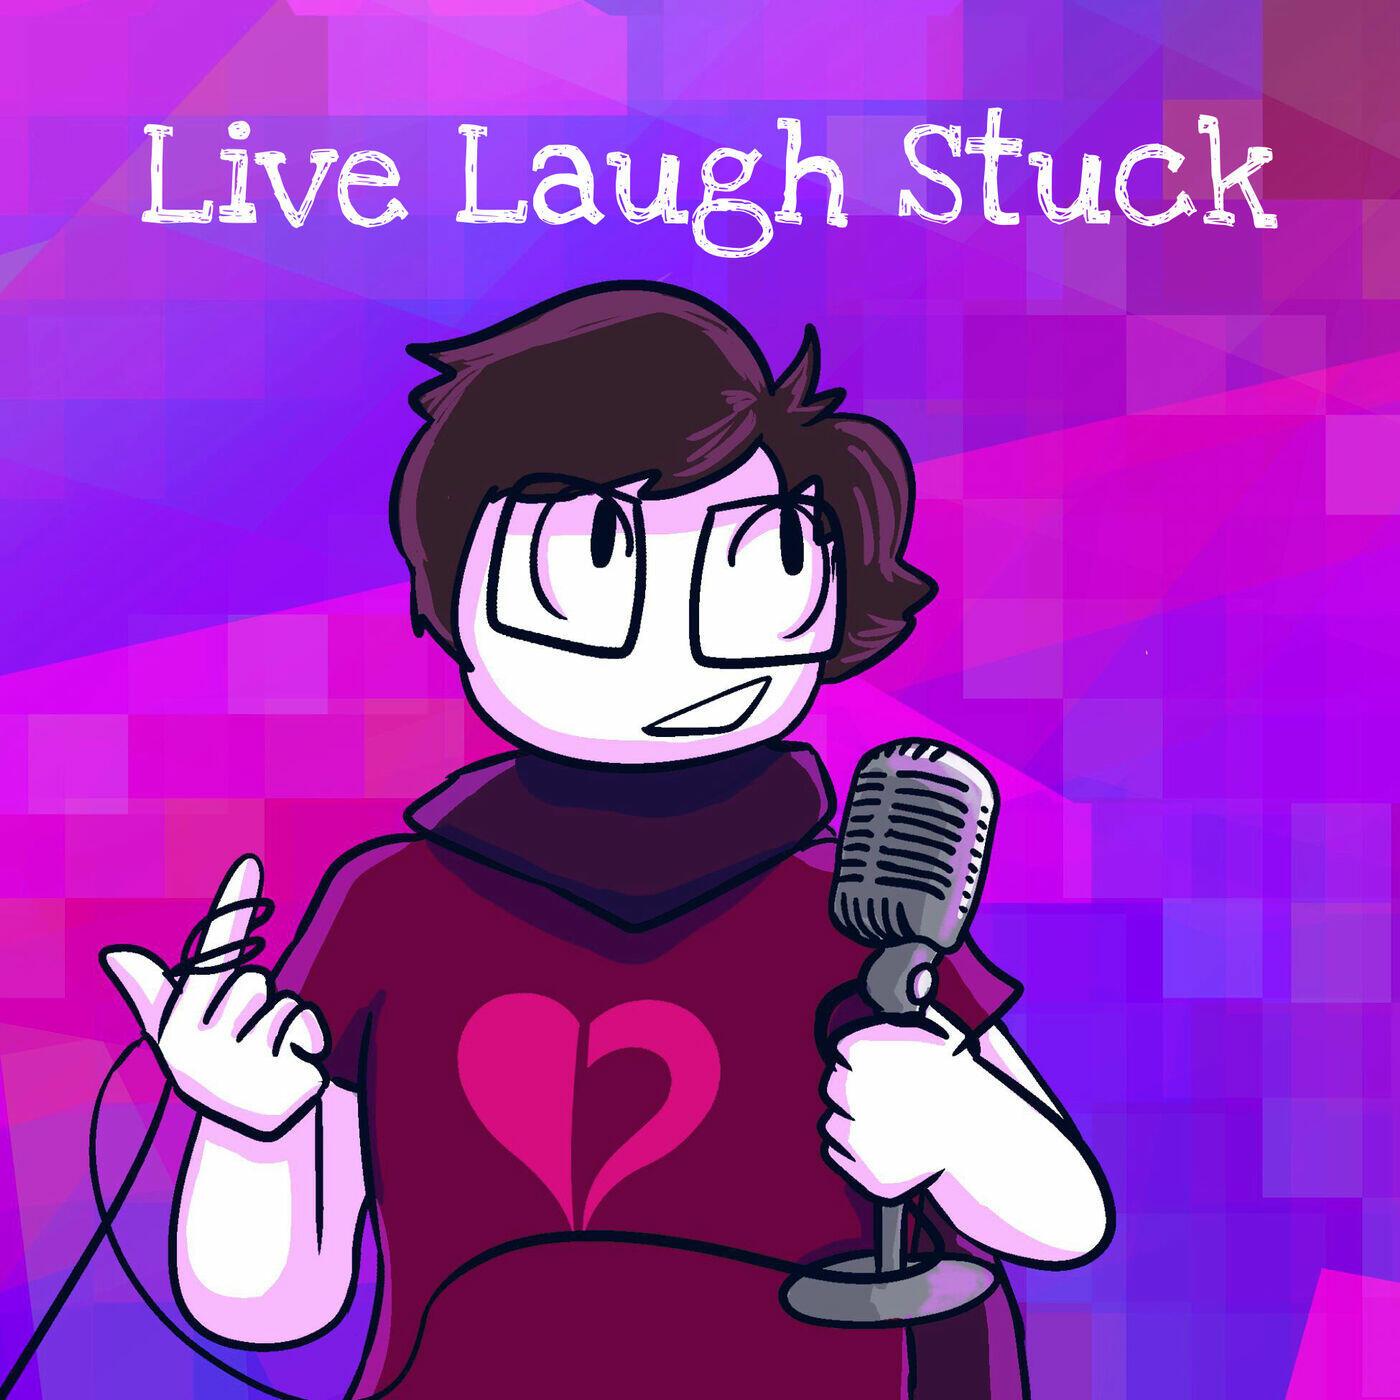 Live, Laugh, Stuck